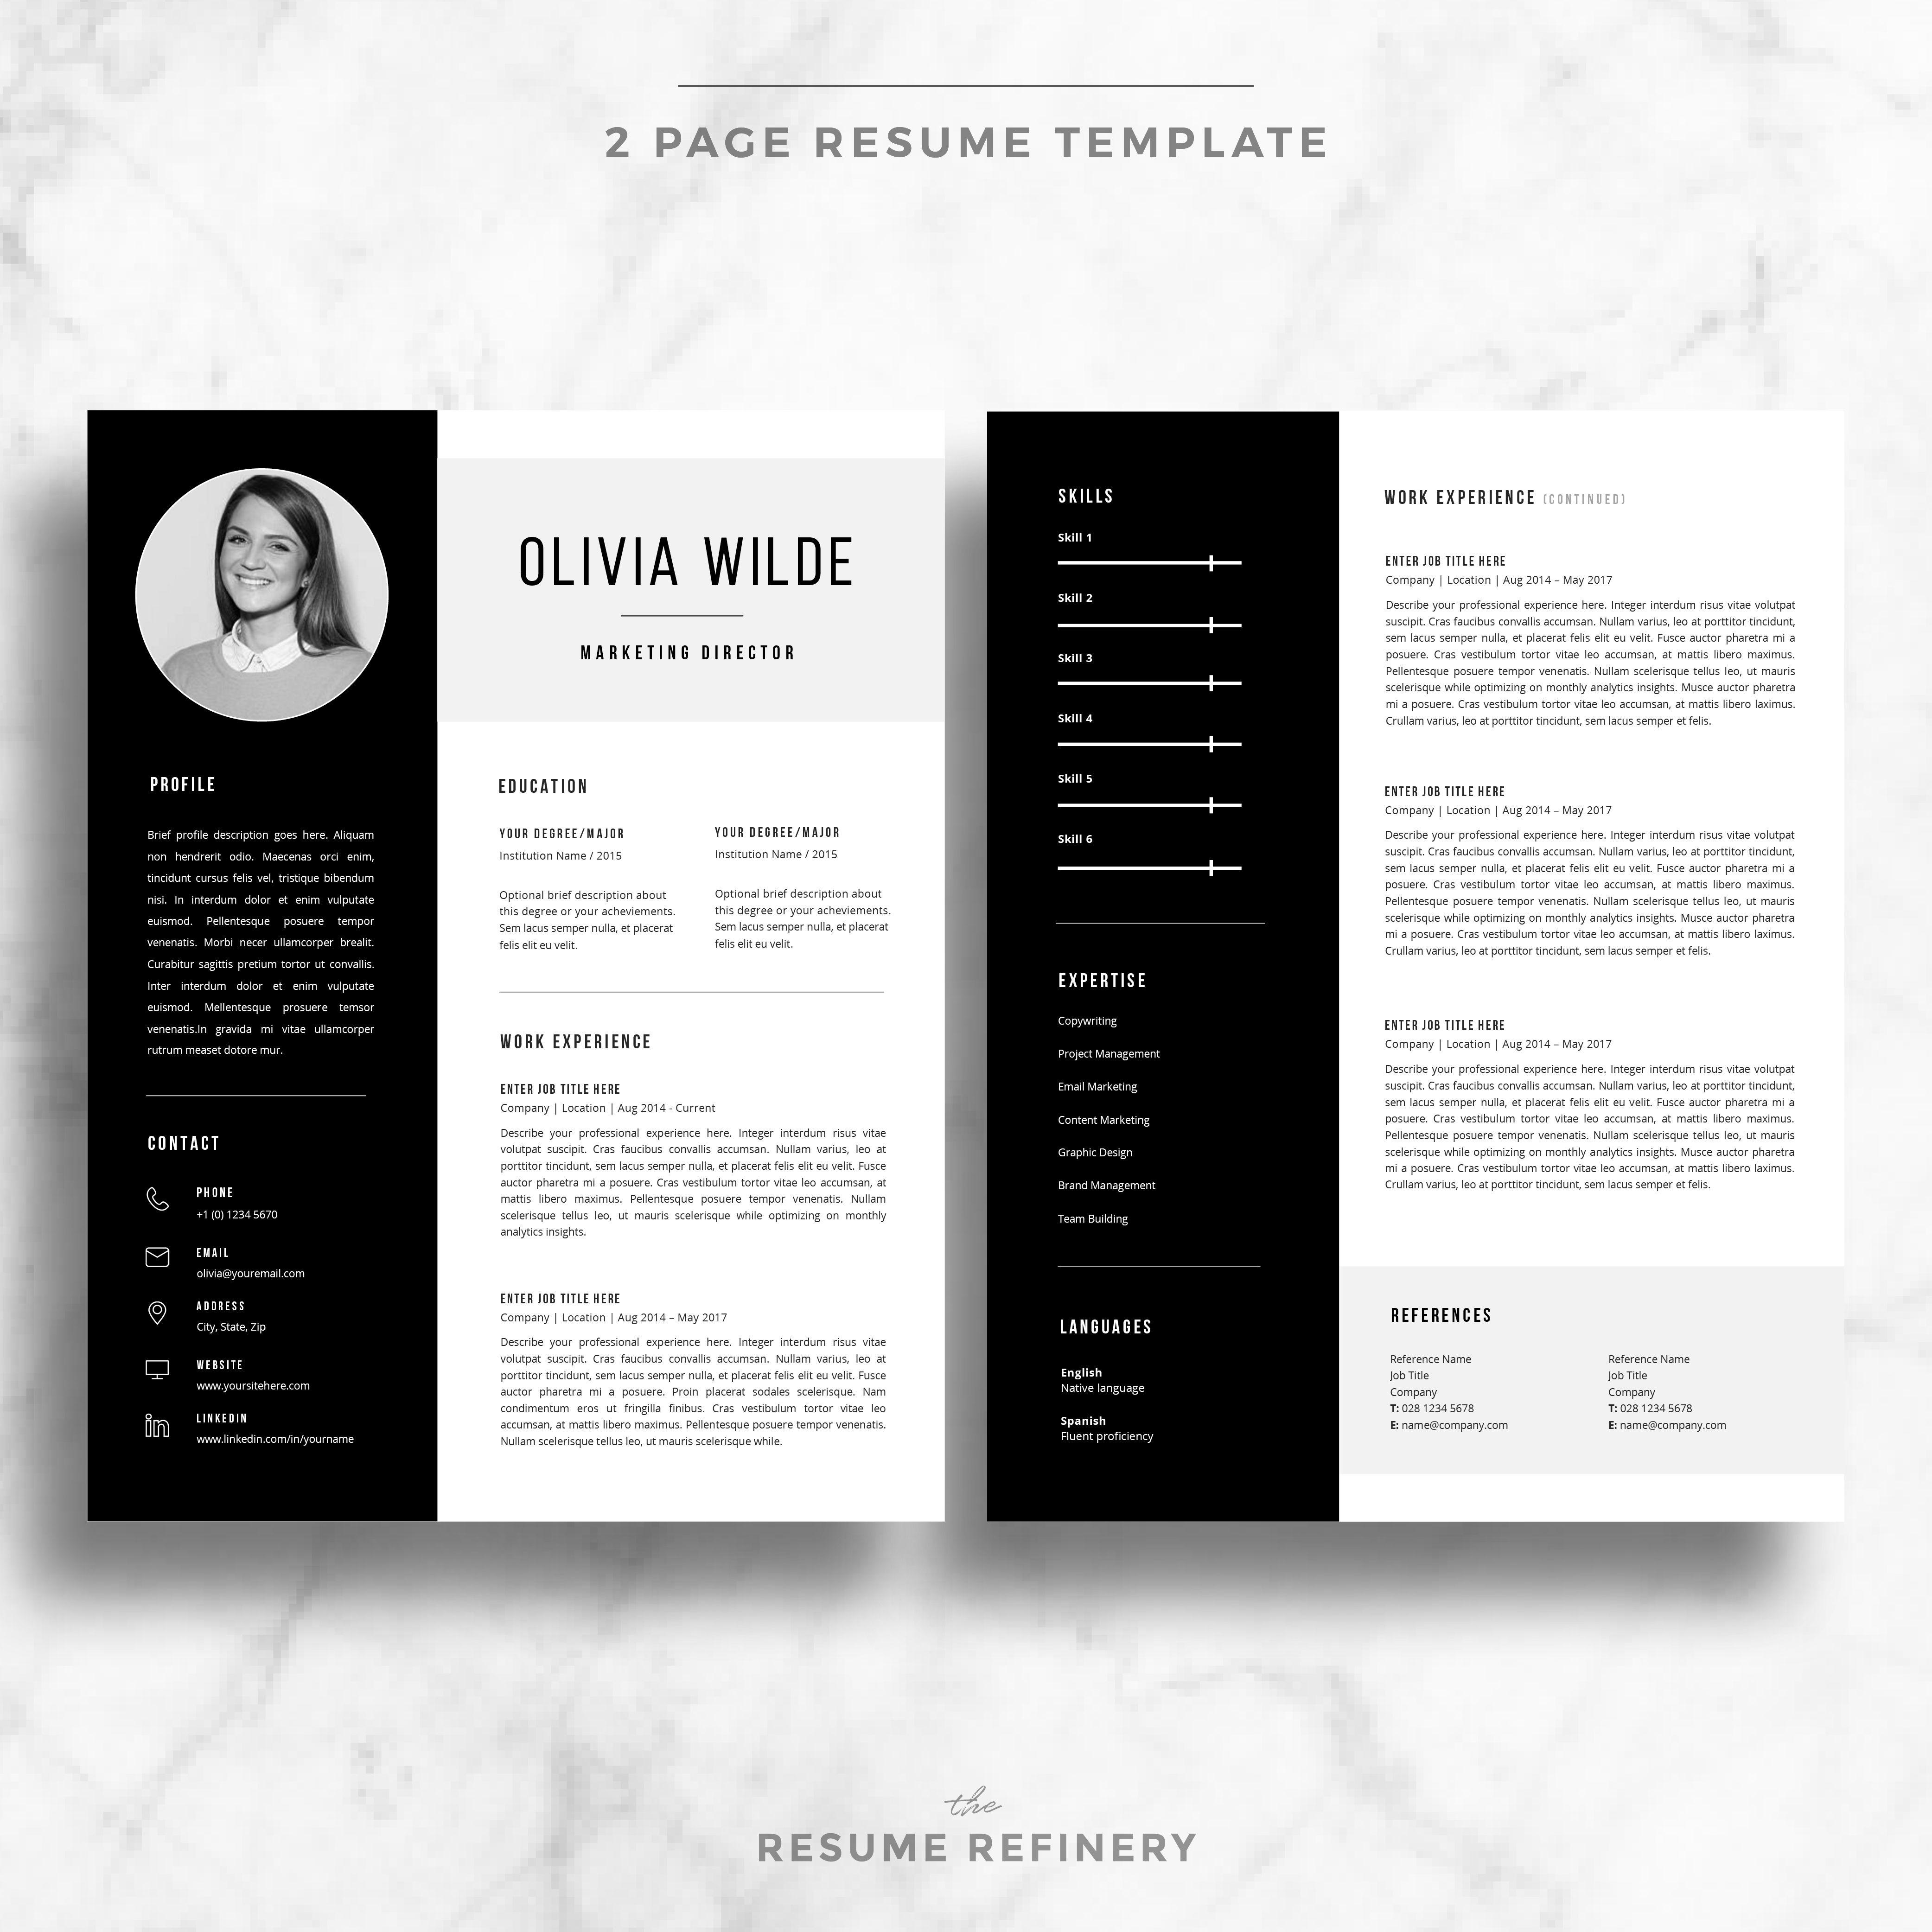 Modern 2 Page Resume Cover Letter Template For Word Bonus Resume Writing Guide Creativ Resume Cover Letter Template Resume Design Cover Letter For Resume